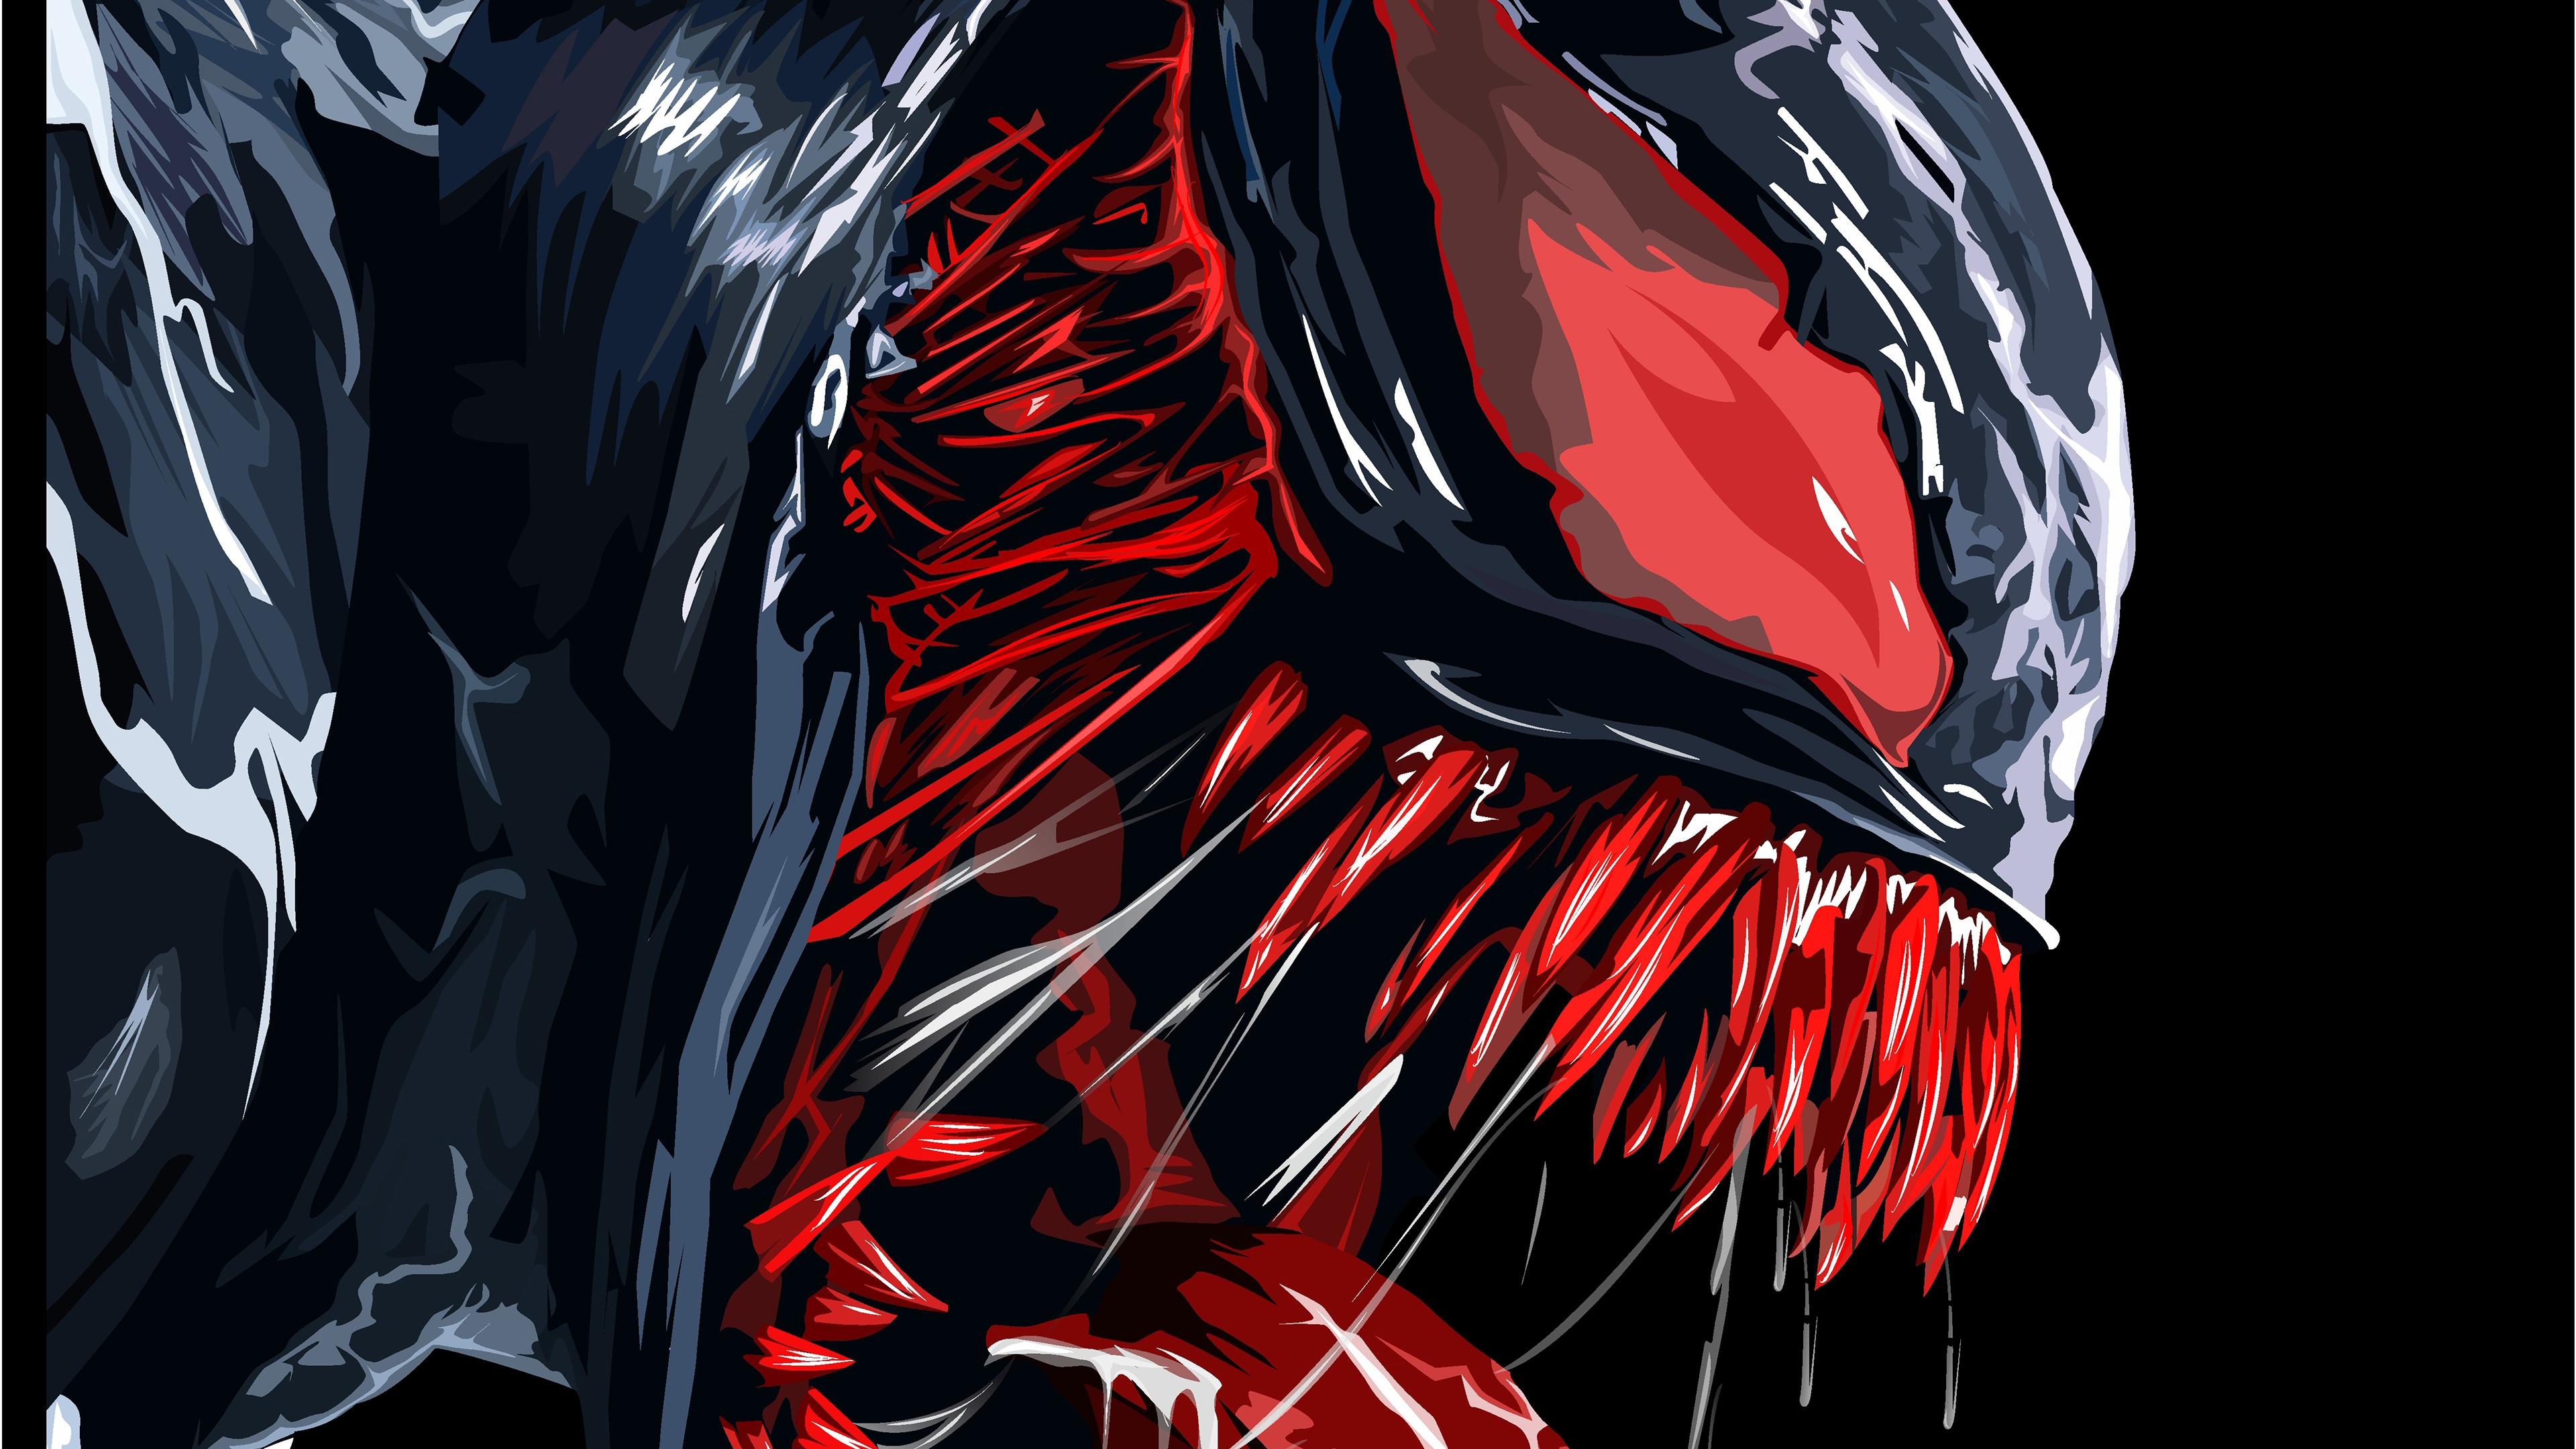 Iphone Venom Wallpaper 4k 3840x2160 Download Hd Wallpaper Wallpapertip